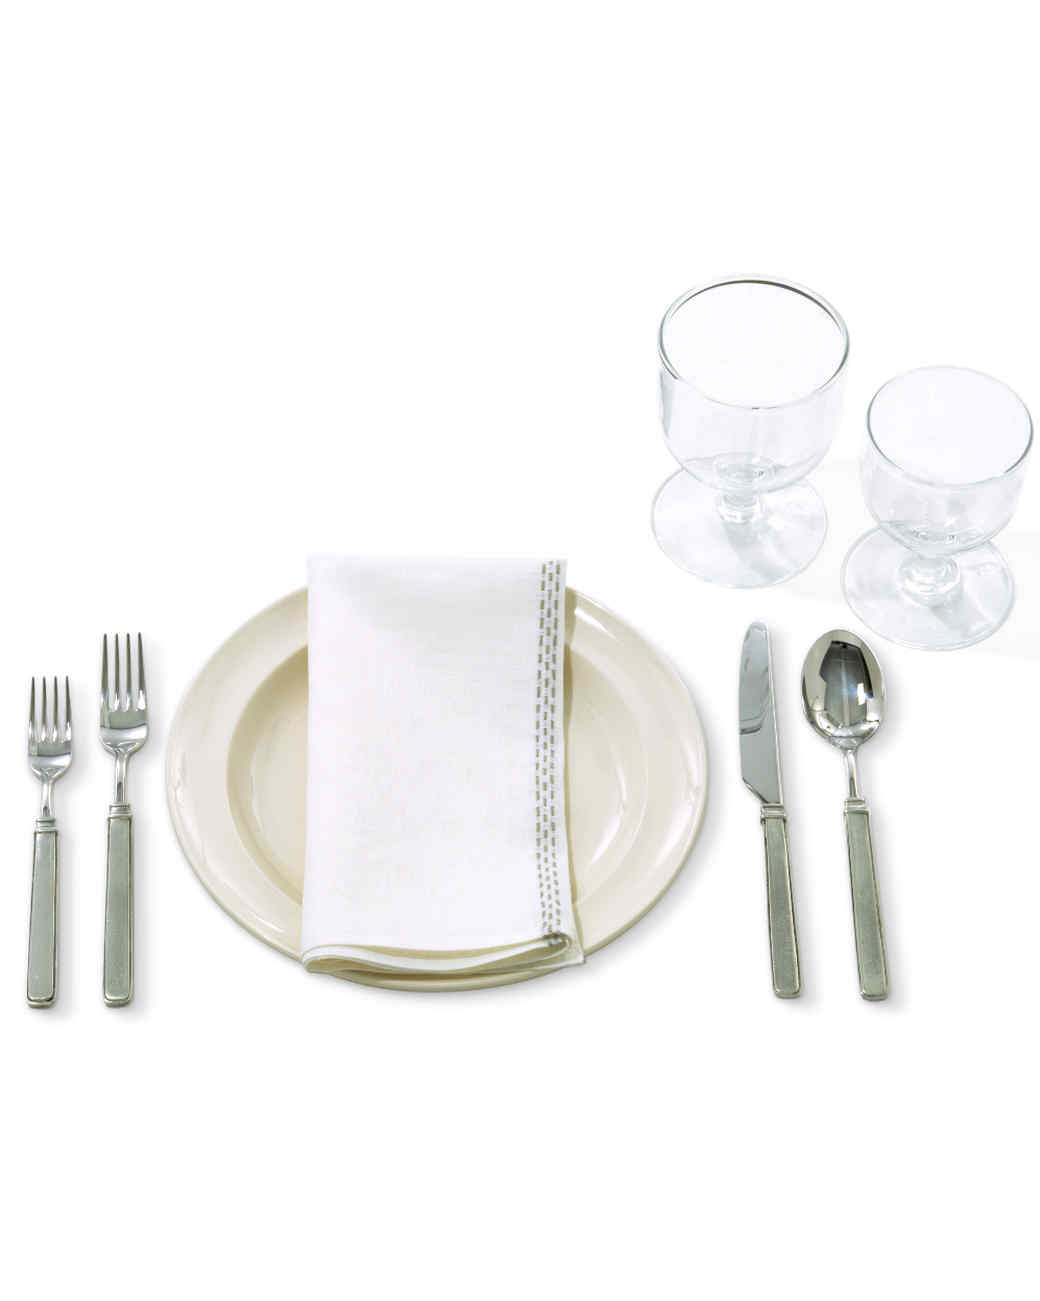 sc 1 st  Martha Stewart & Setting the Table 101 | Martha Stewart